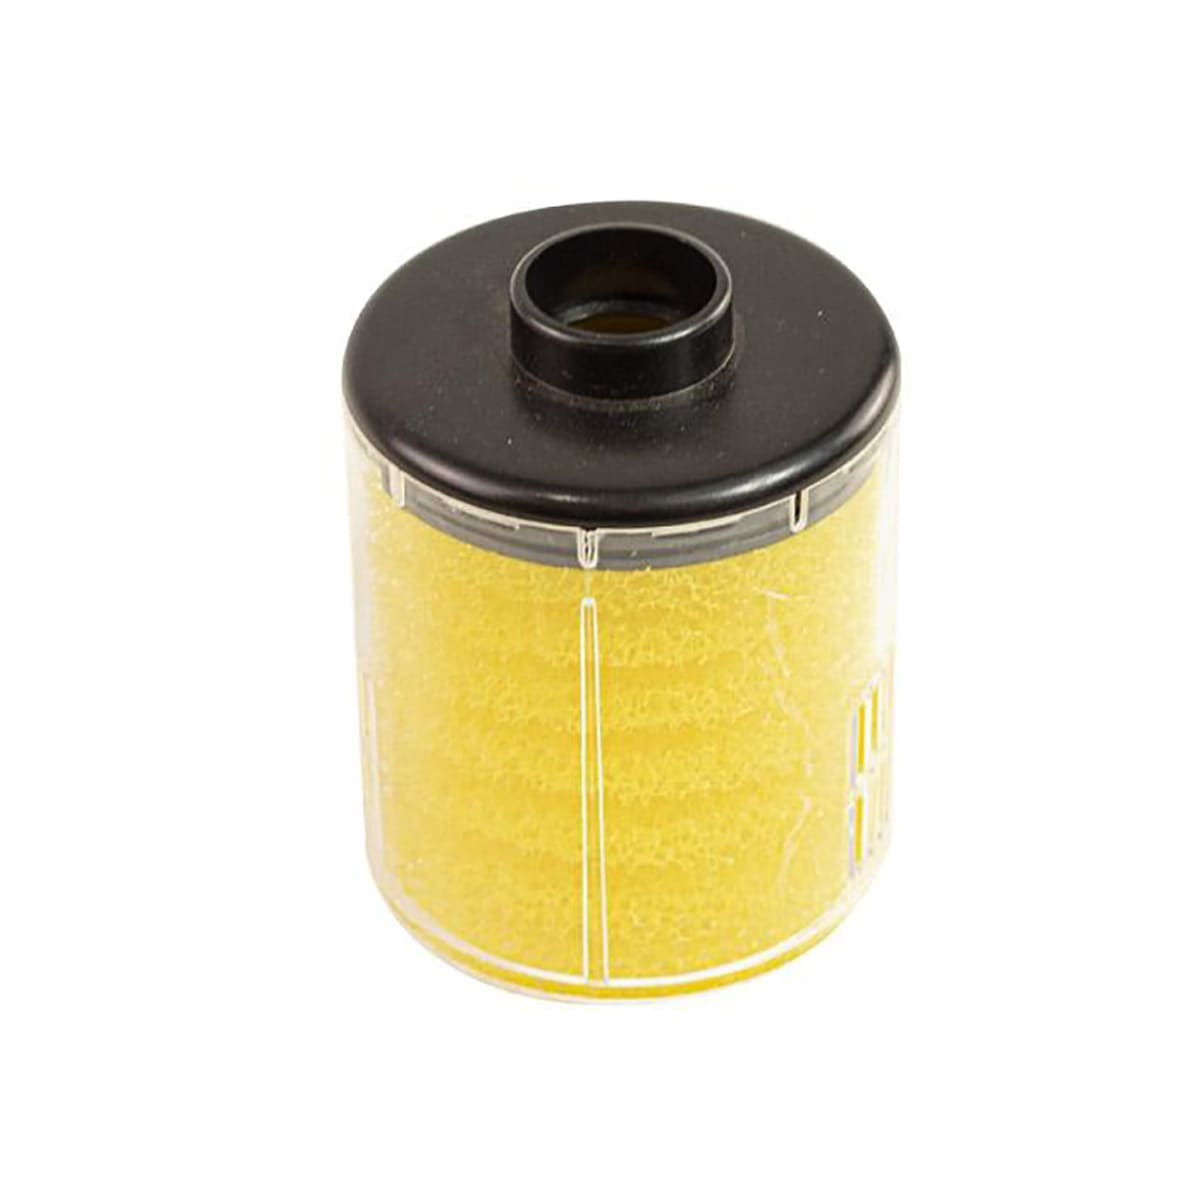 Filtro Interno para Aquários Jad SP-1300 II 9w 400 L/H